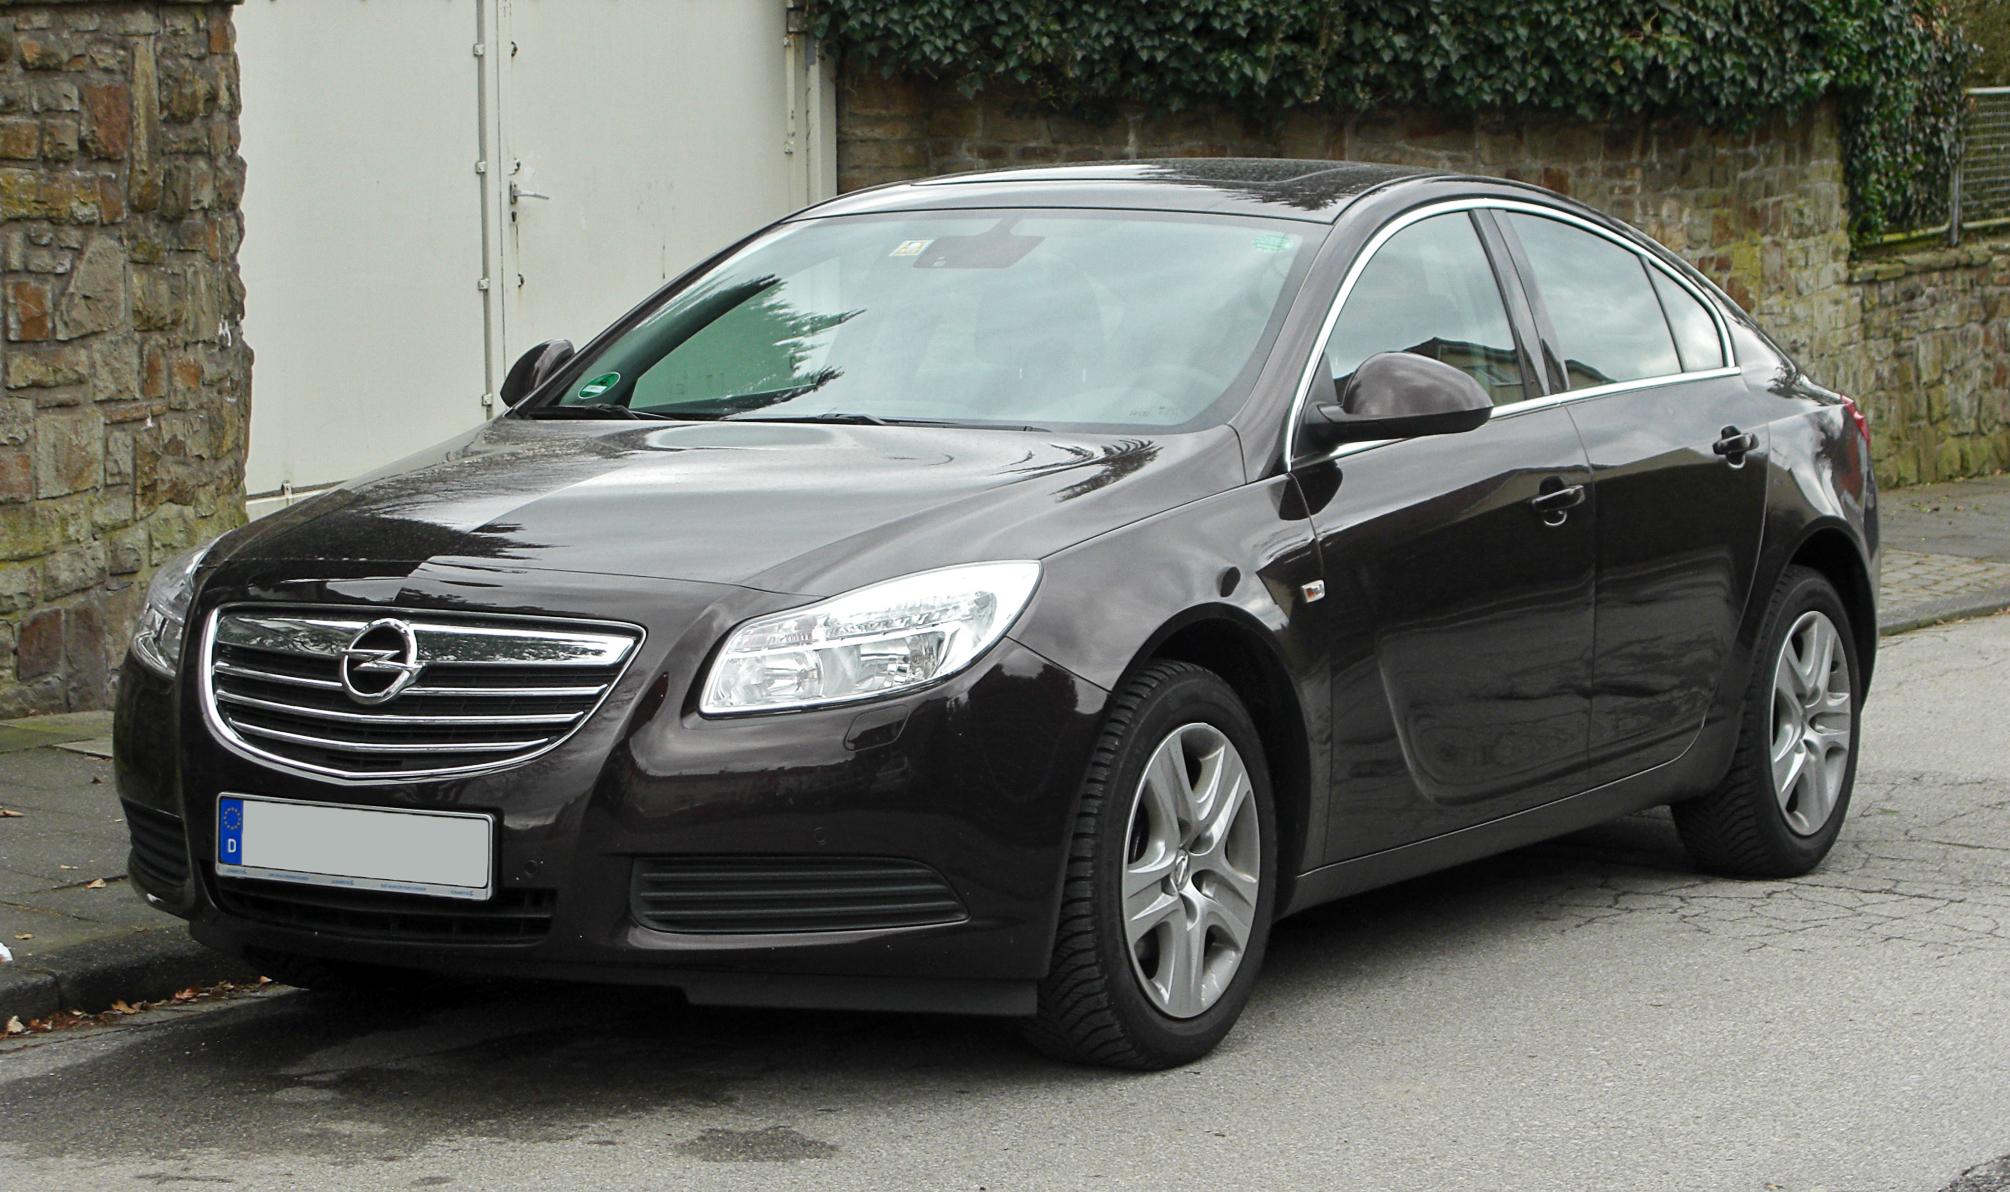 File:Opel Insignia 2.0 CDTI Ecotec Selection ...